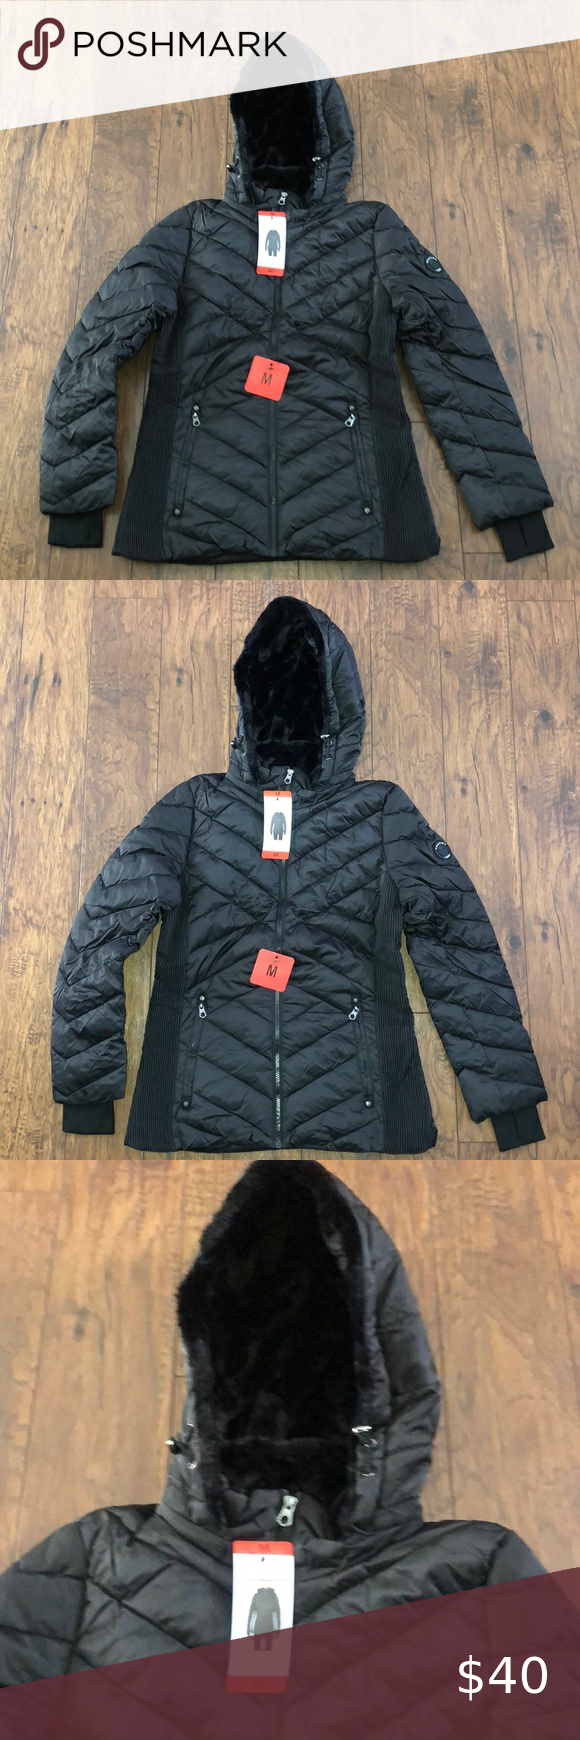 Nautica Winter Coat Nwt Host Pick In 2021 Coats Jackets Women Winter Coat Sleeveless Puffer [ 1740 x 580 Pixel ]